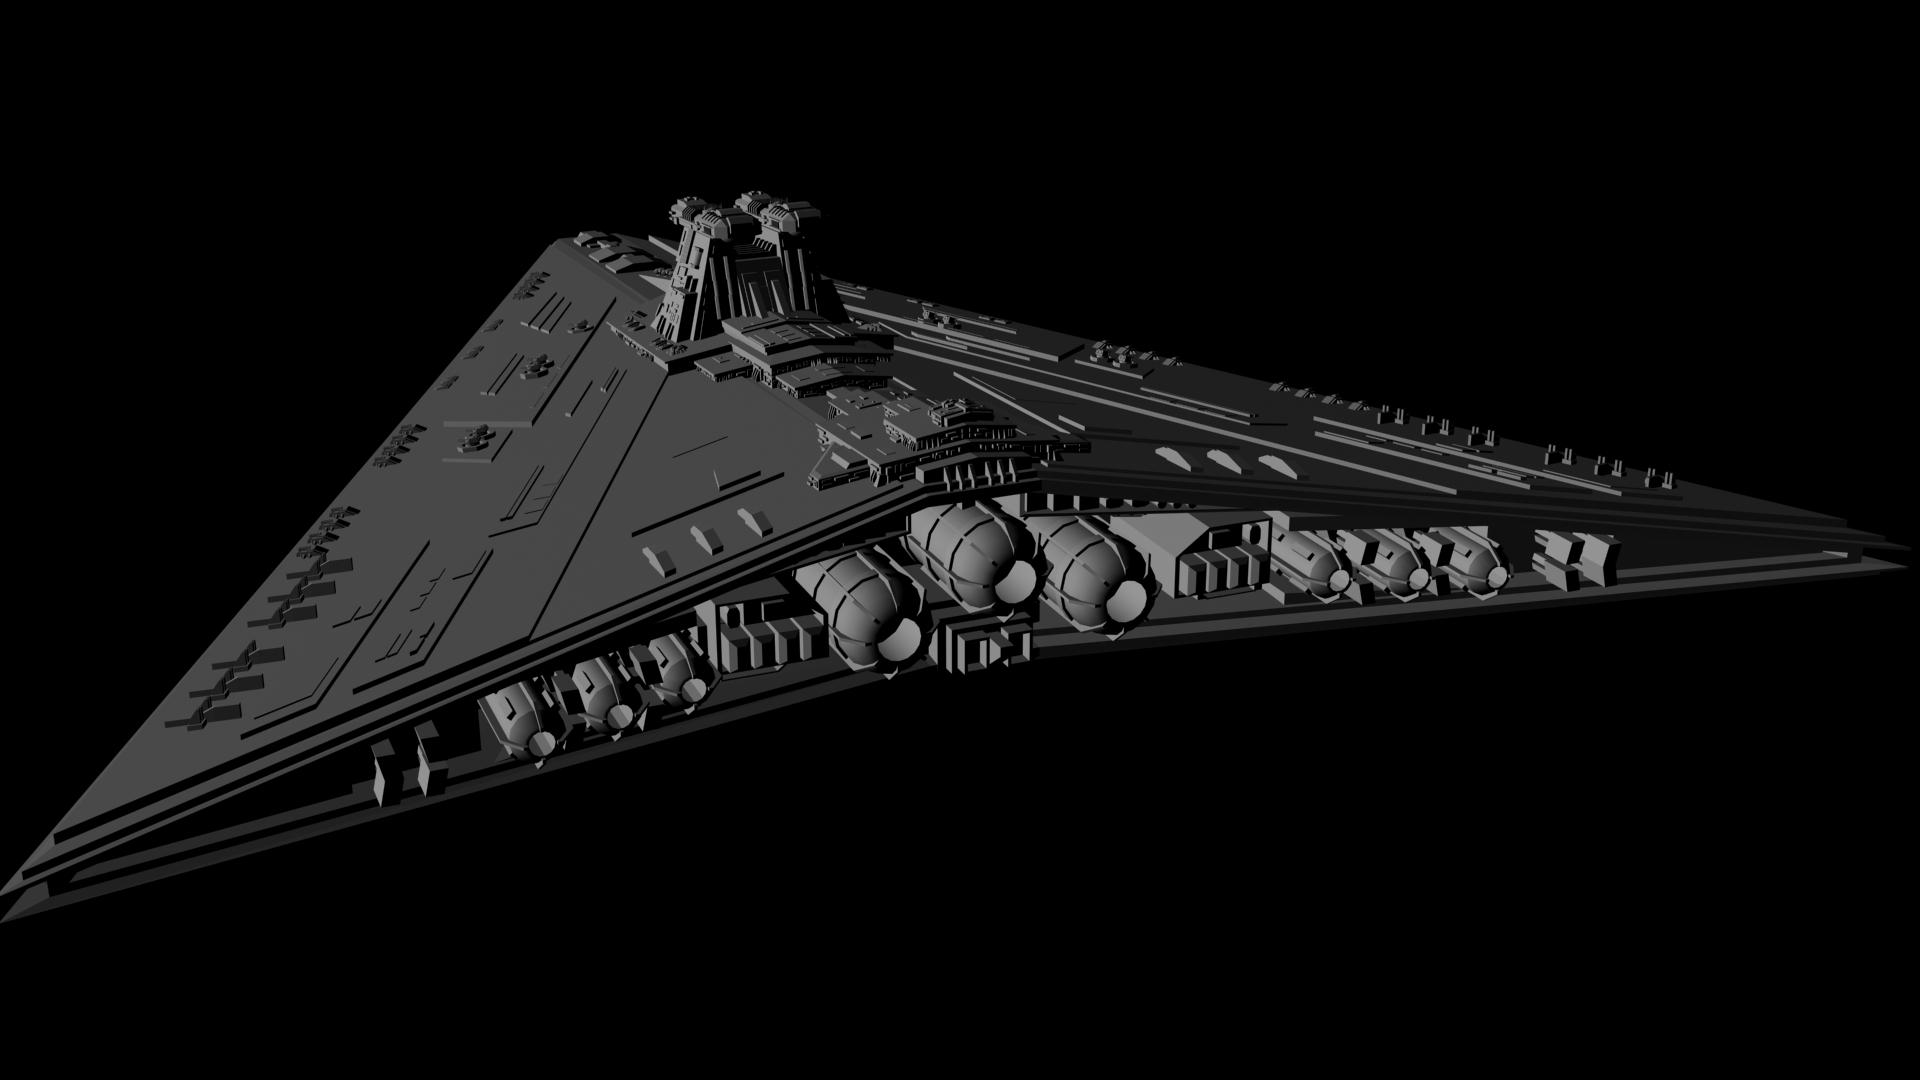 Free Download Pin Imperial Super Star Destroyer Hd Desktop